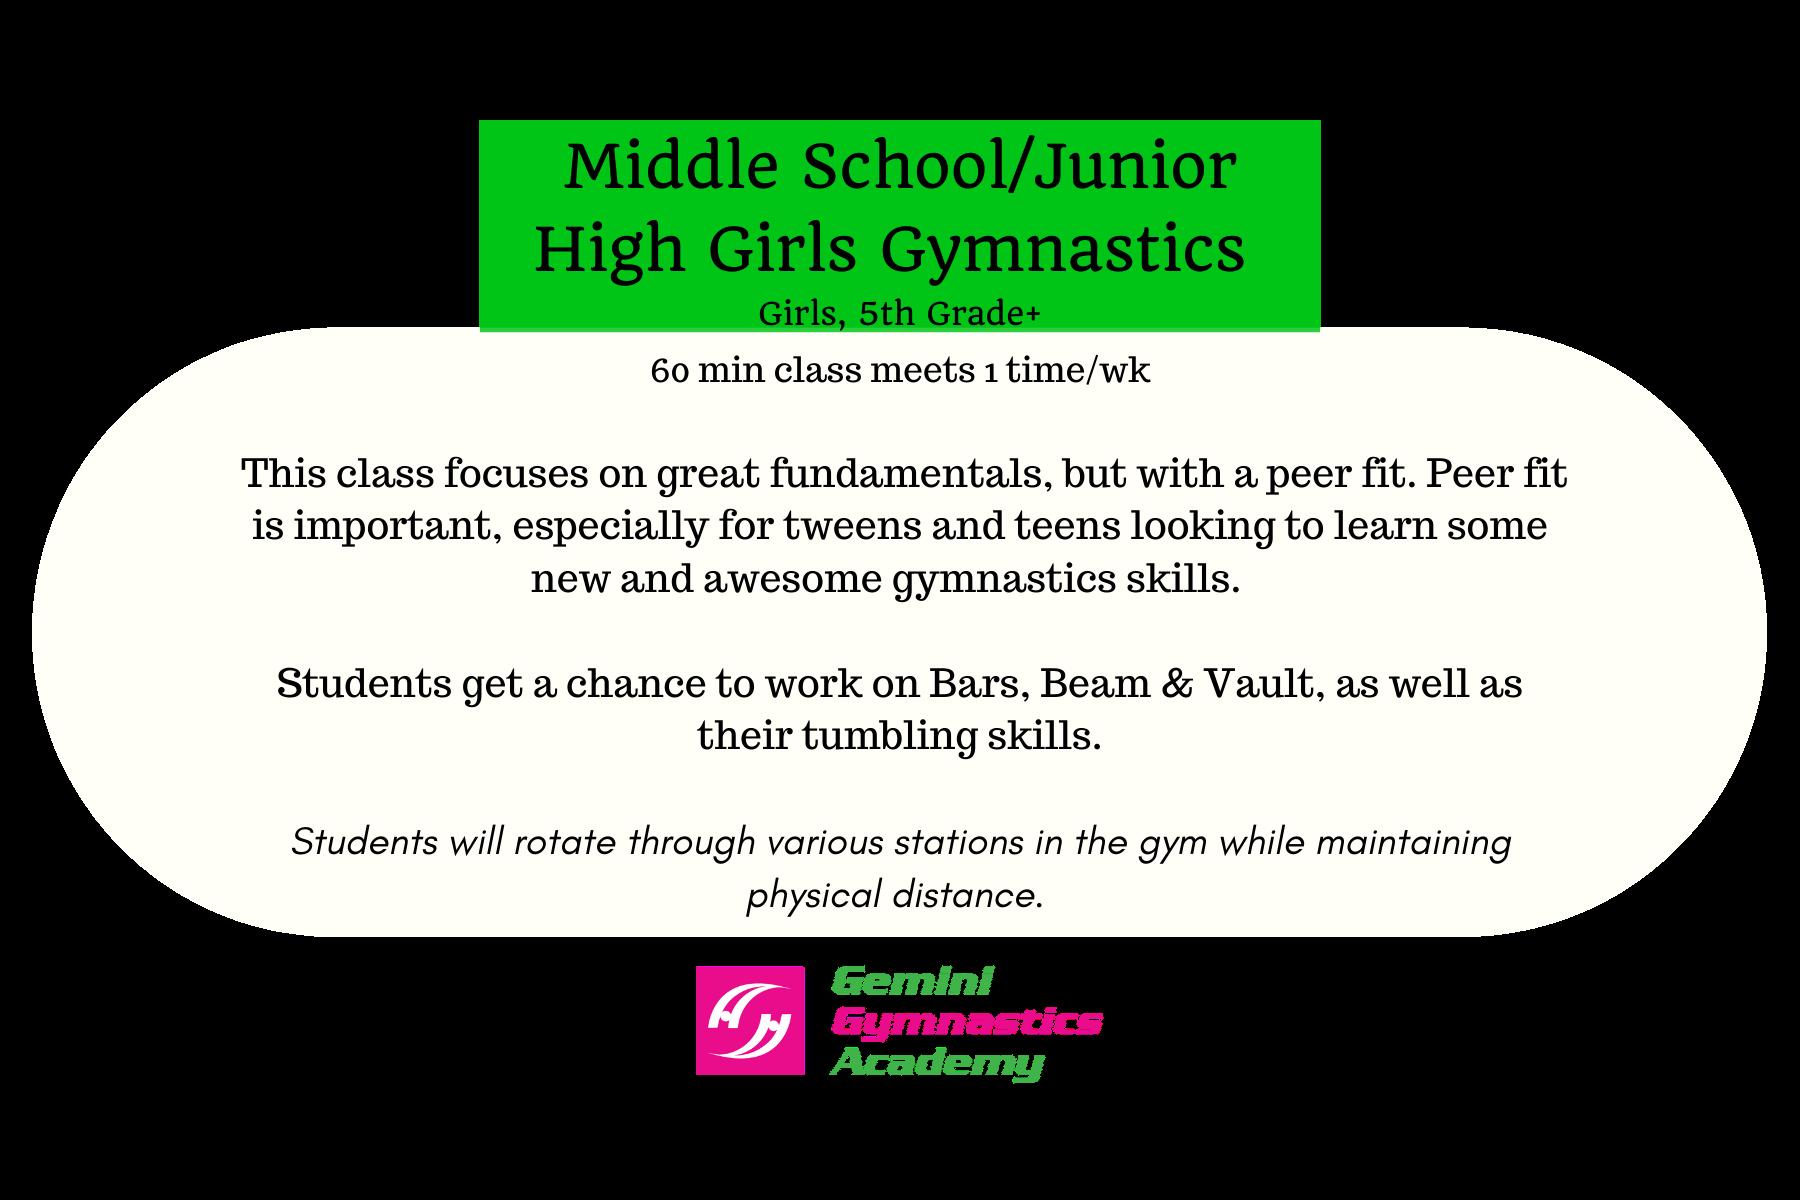 MS_JH gymnastics